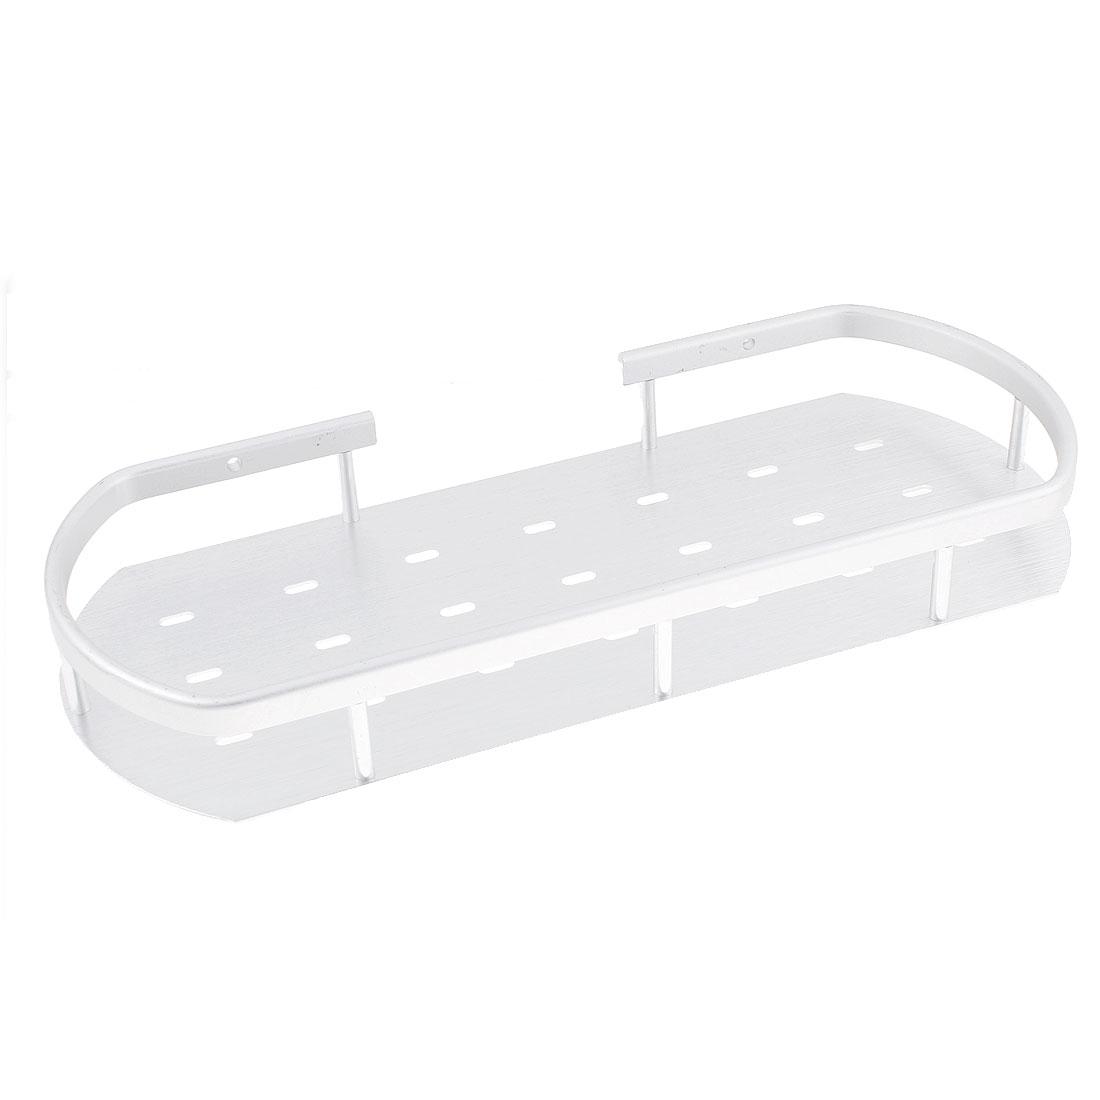 Aluminum Wall Mount Single Tier Bathroom Corner Shelf Shower Storage Holder